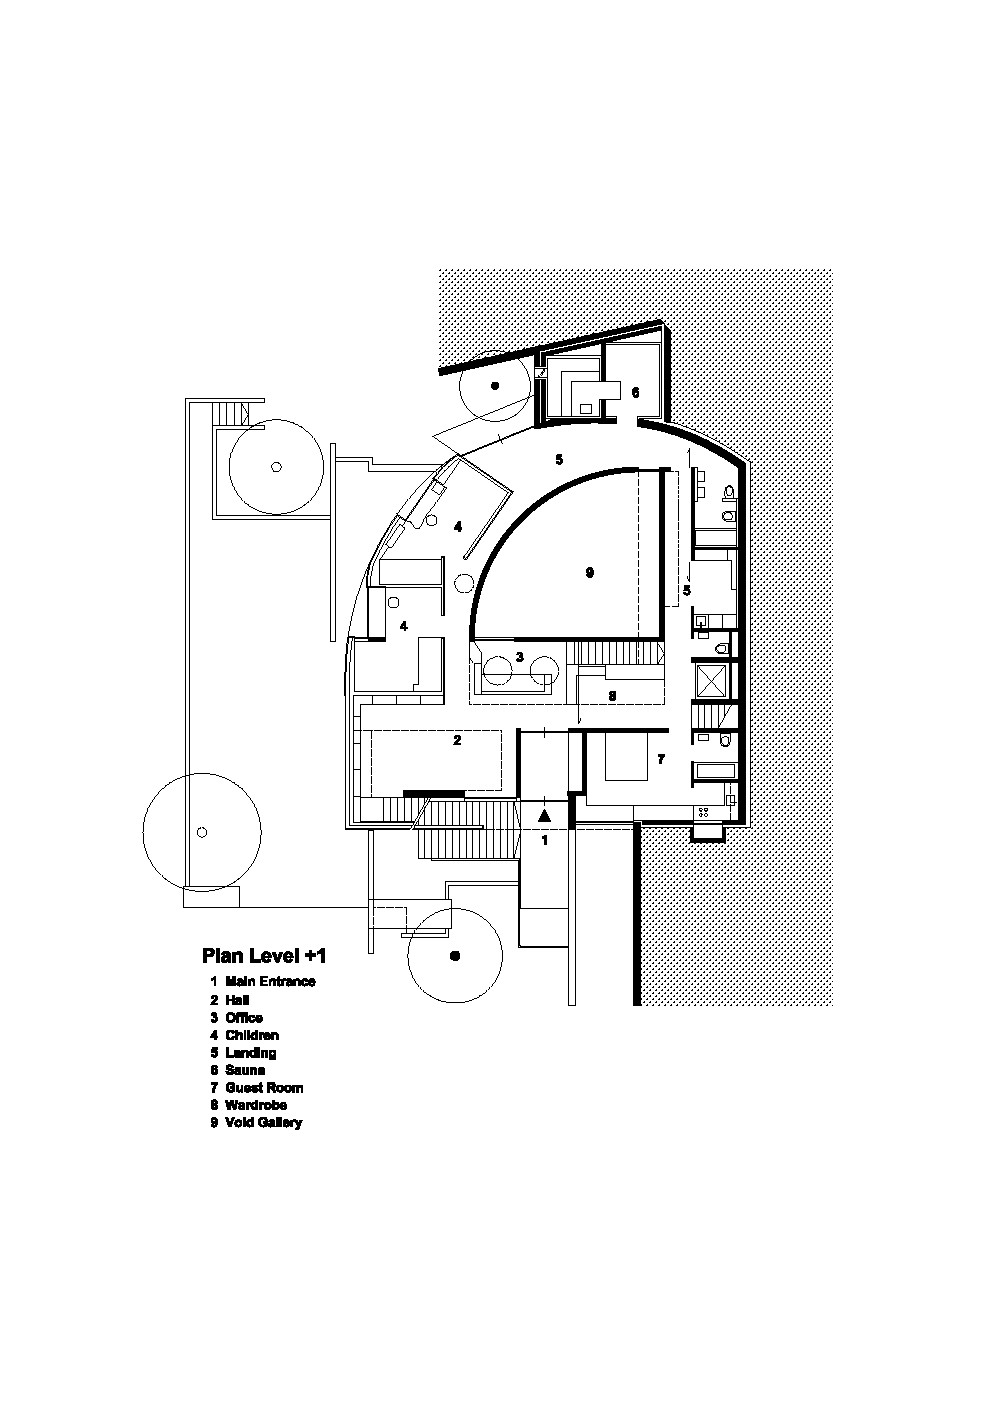 House D / Pauhof Architekten. Plan